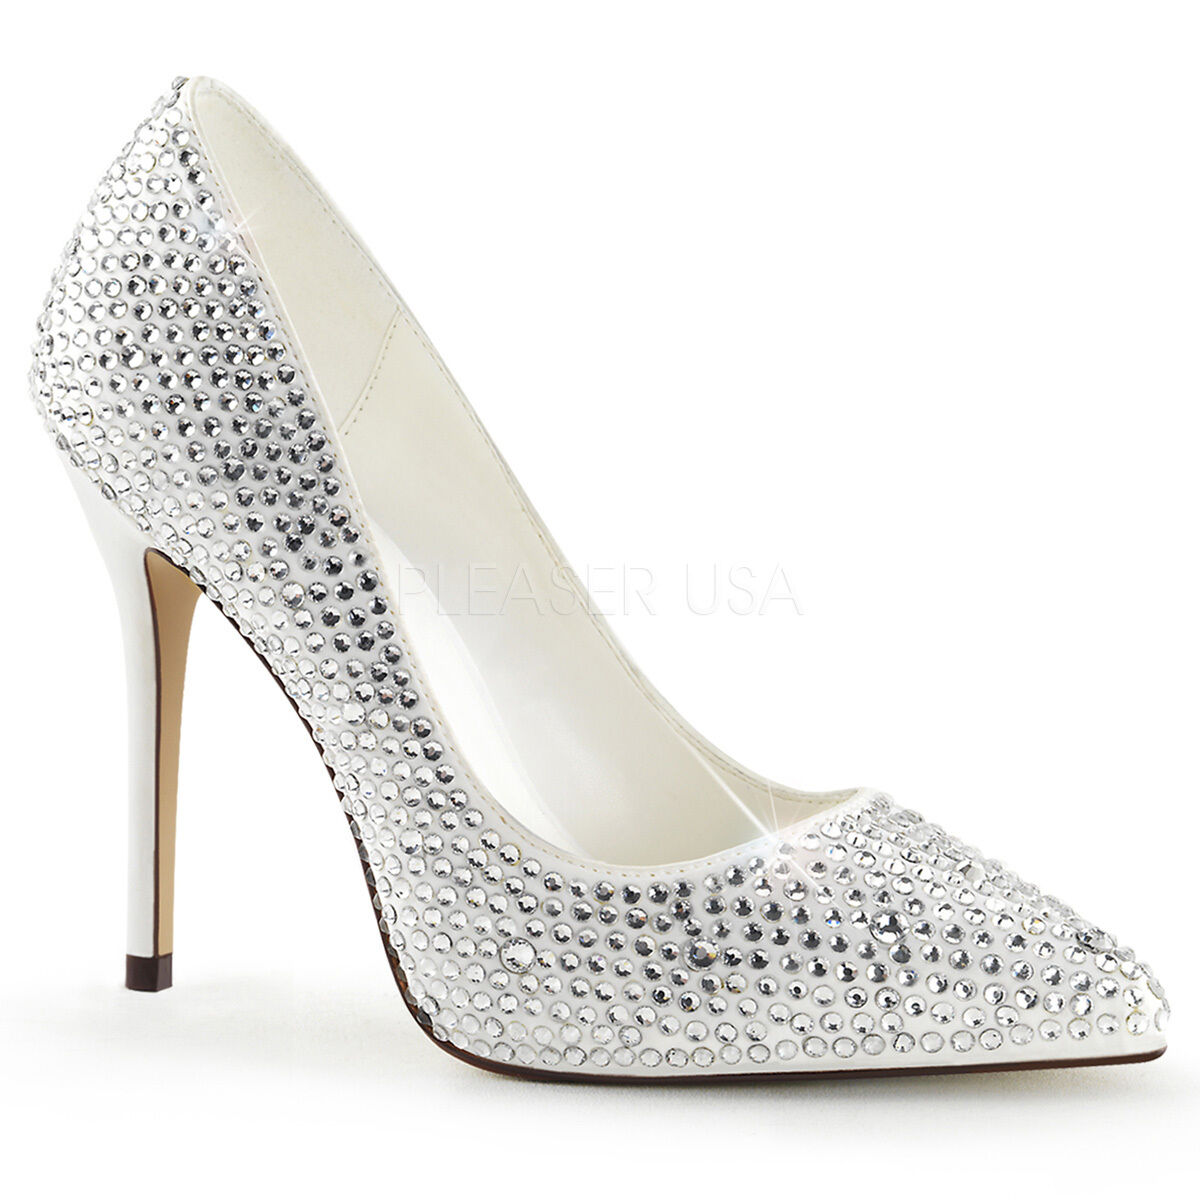 Amuse 20 RS Ivory blanc Satin Pointy Toe Rhinestone Pump chaussures 5  Heel  5-12